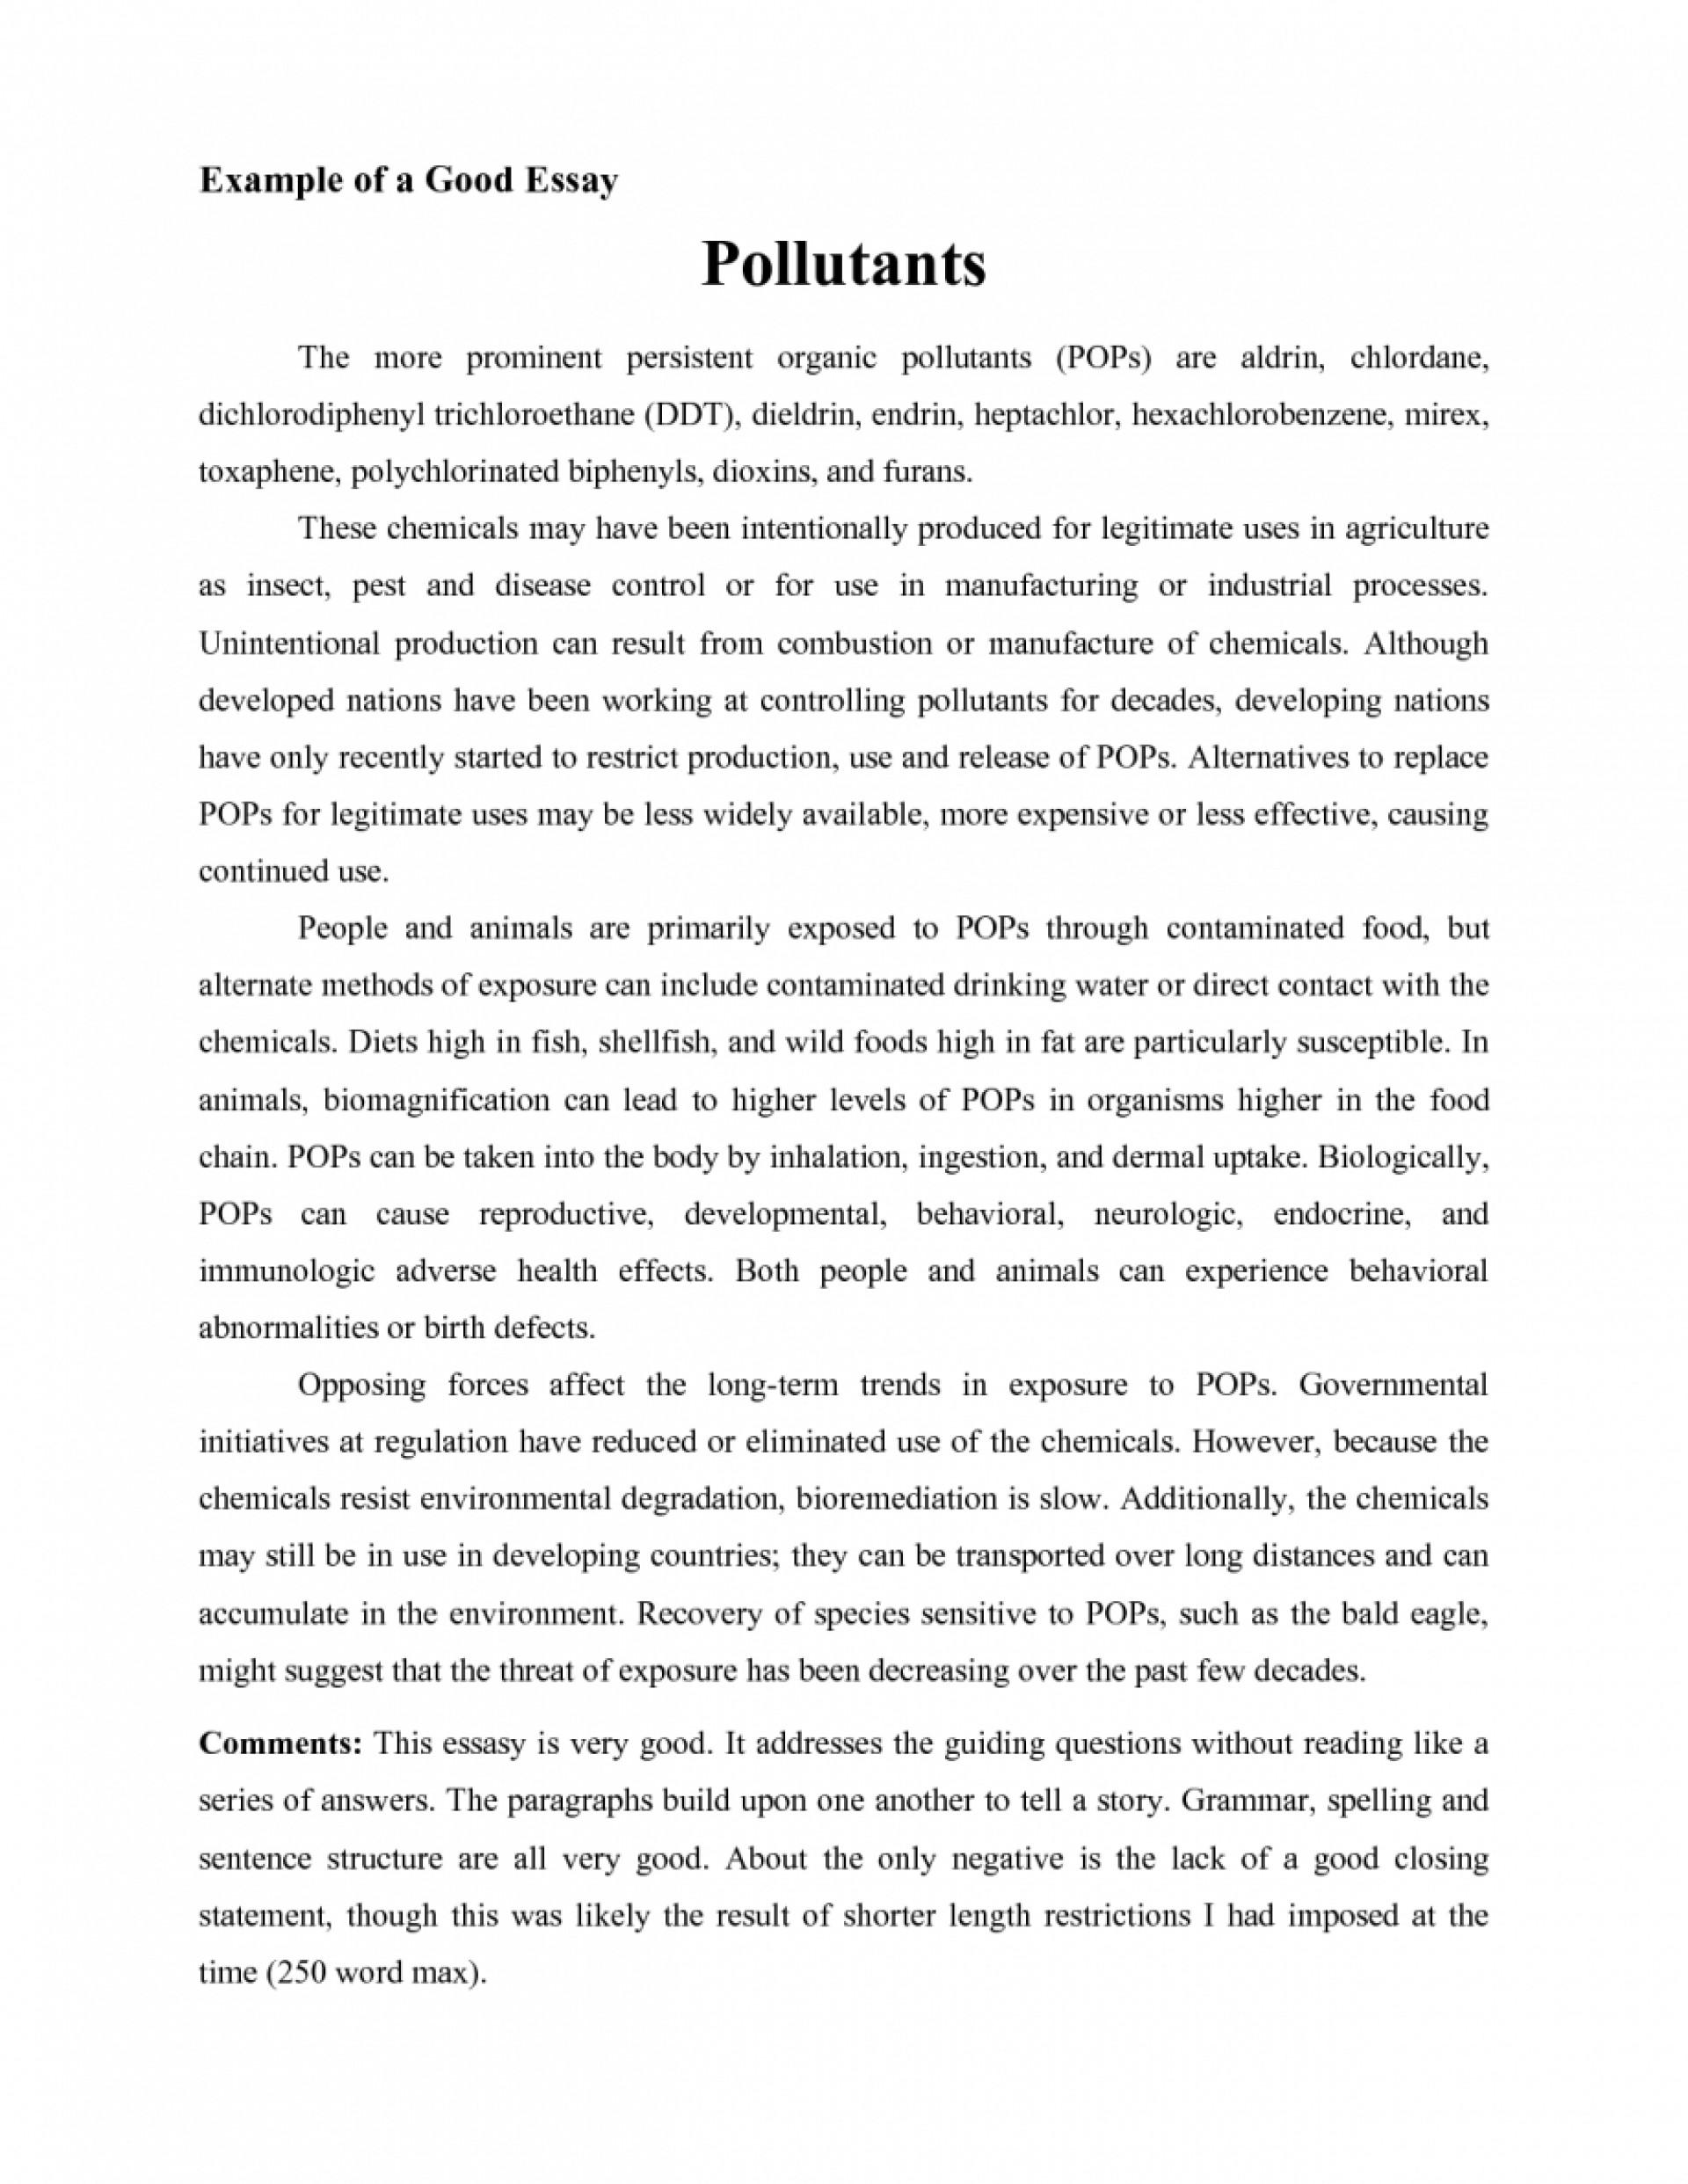 essay examples english essay example english examples of resumes  essay example english examples of resumes cover page title essay example  english examples of resumes cover